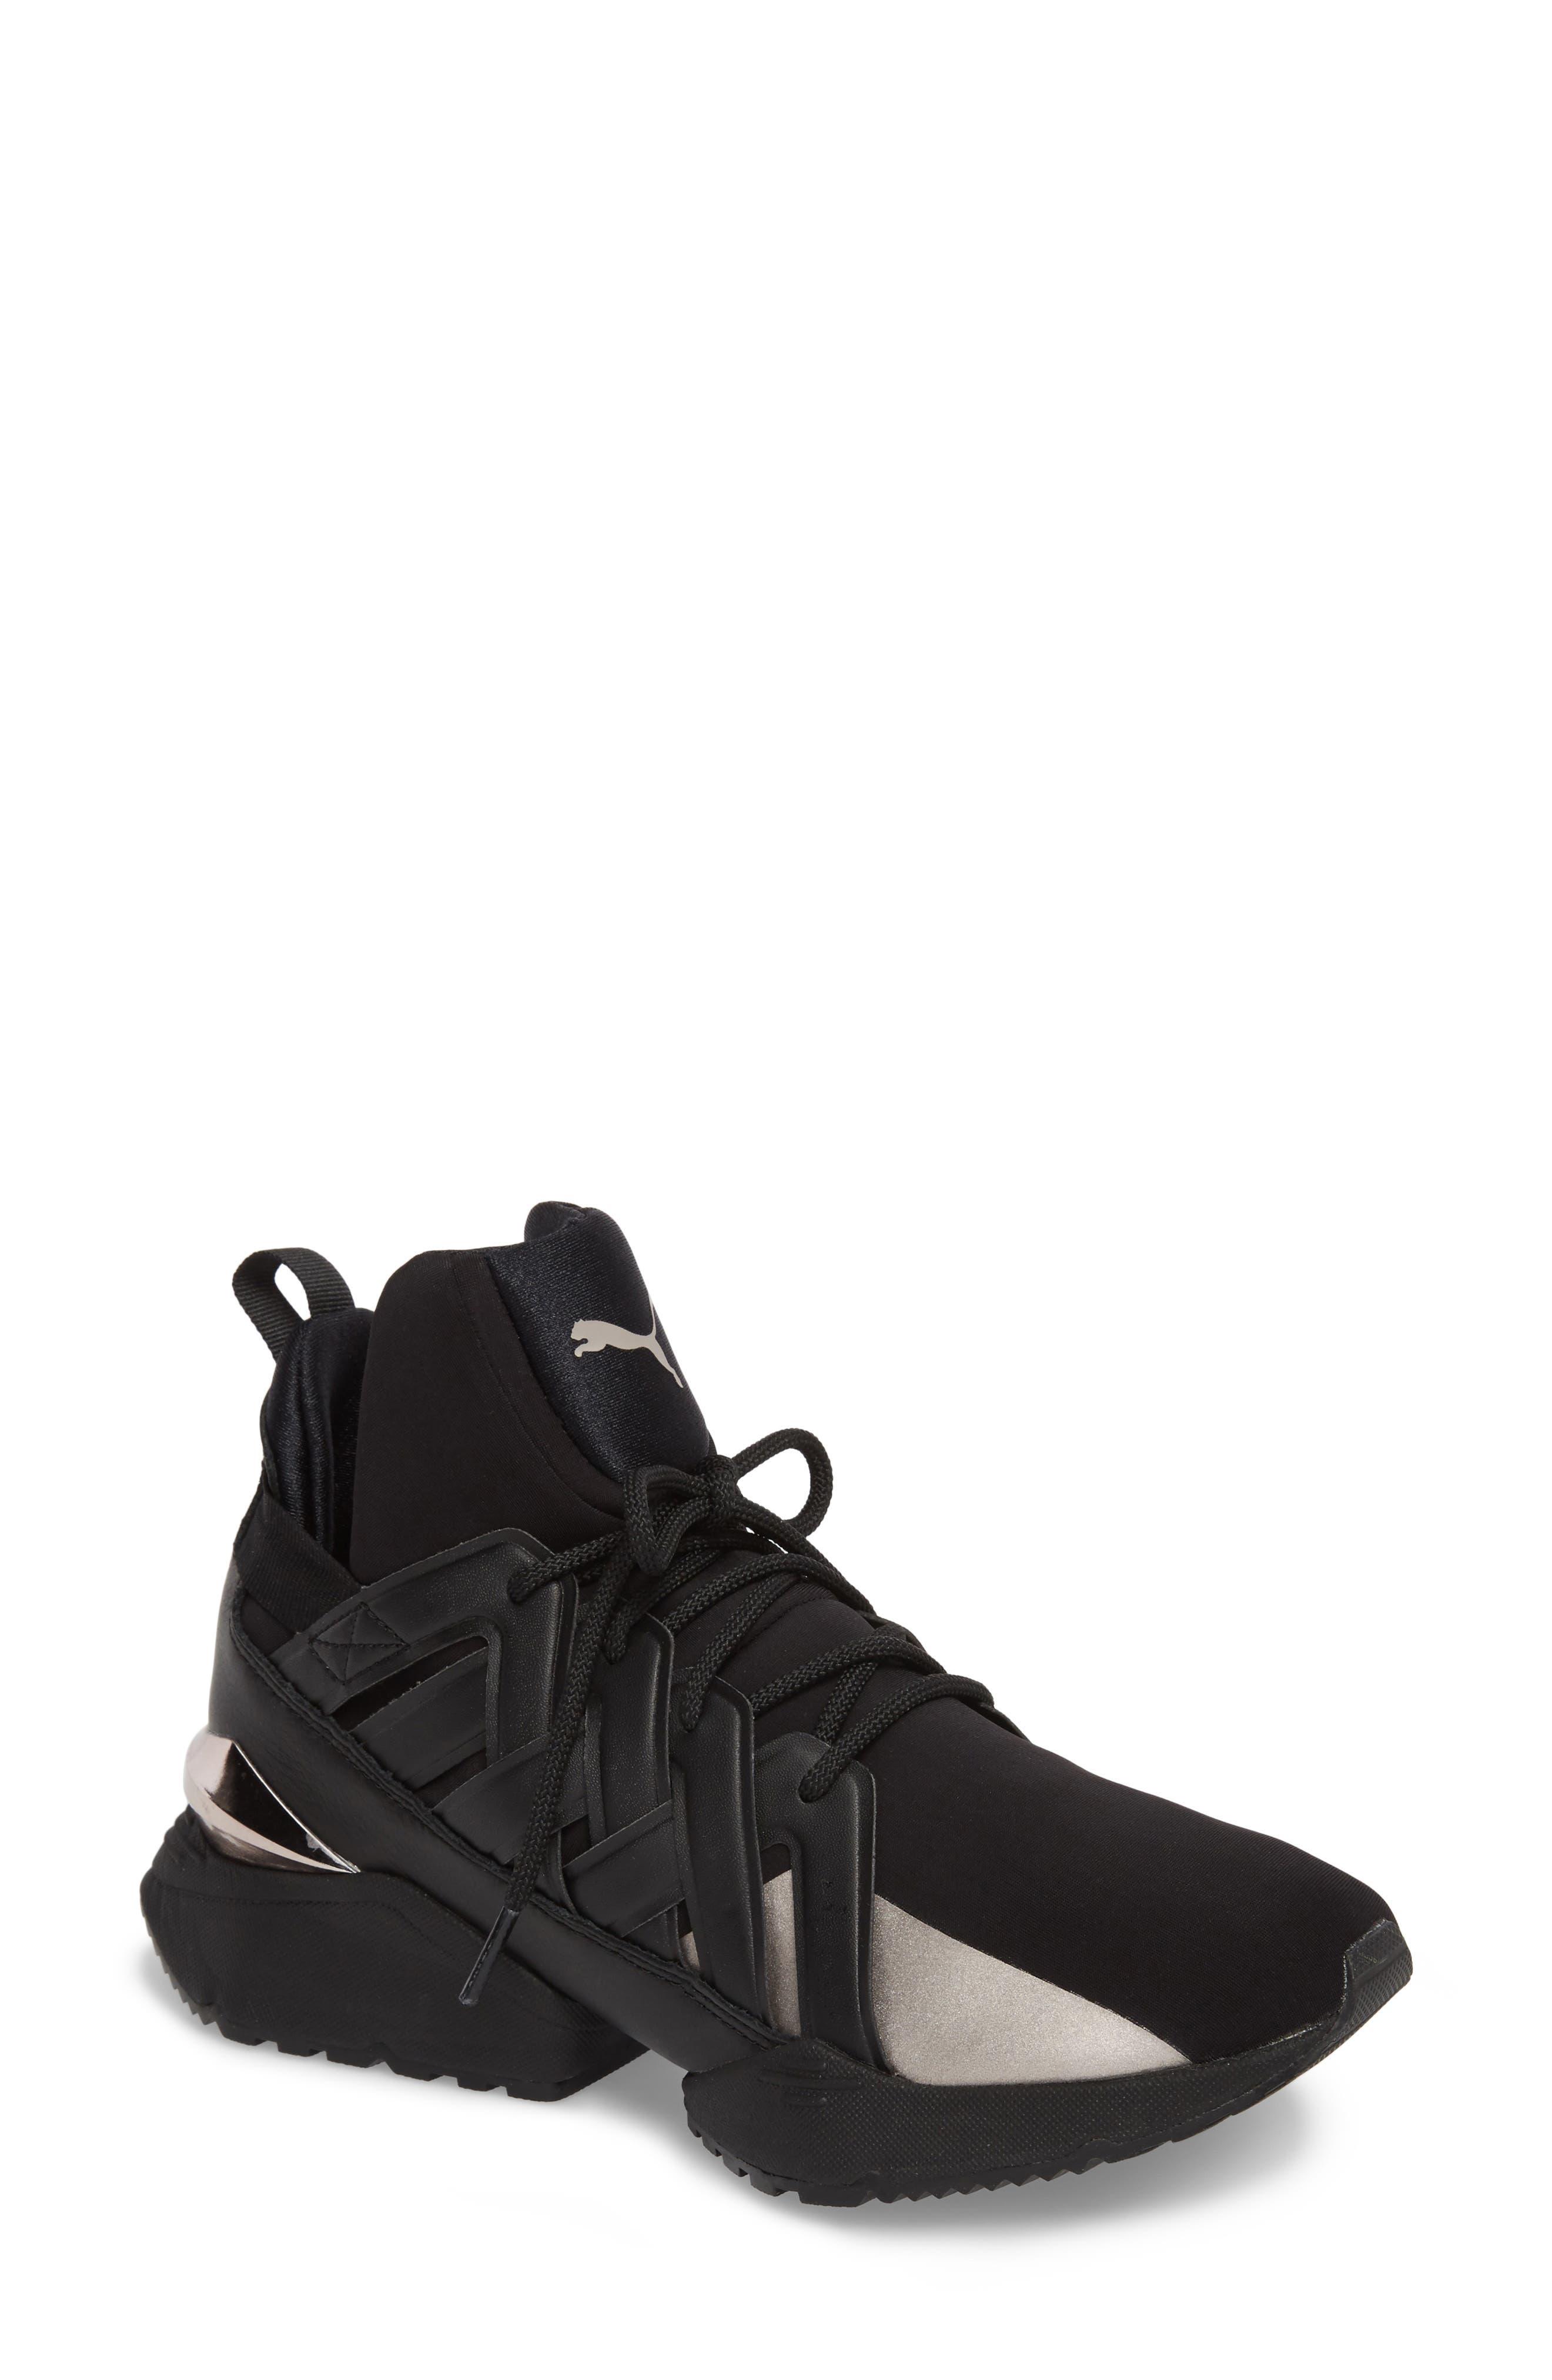 Muse Echo Sneaker,                             Main thumbnail 1, color,                             Puma Black